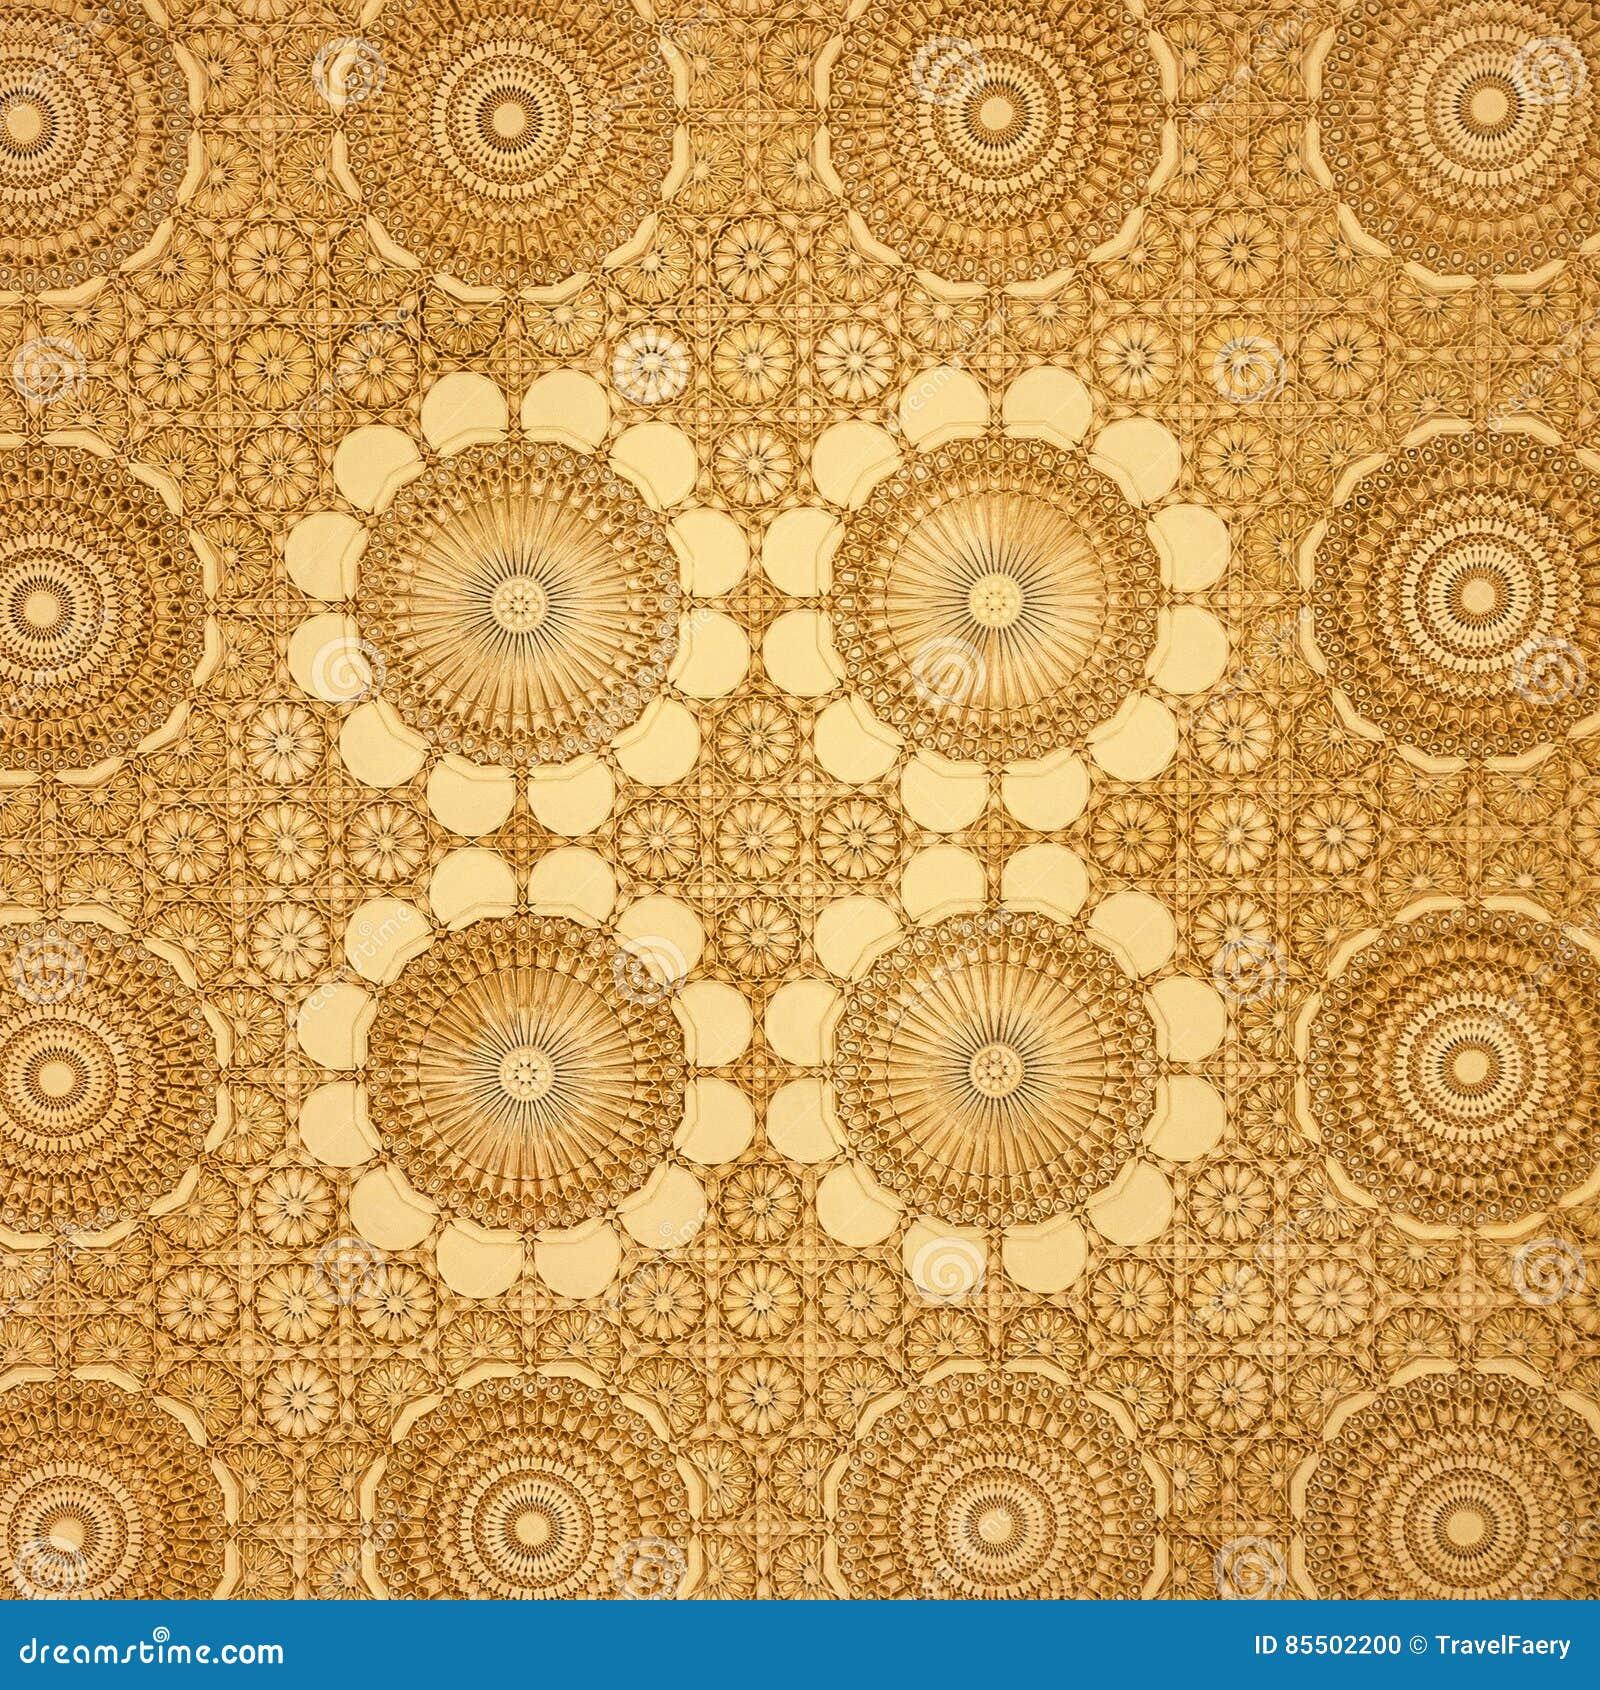 Mosaic ceramic tile decoration of hassan ii mosque casablanca mosaic ceramic tile decoration of hassan ii mosque casablanca royalty free stock photo download mosaic ceramic tile dailygadgetfo Images